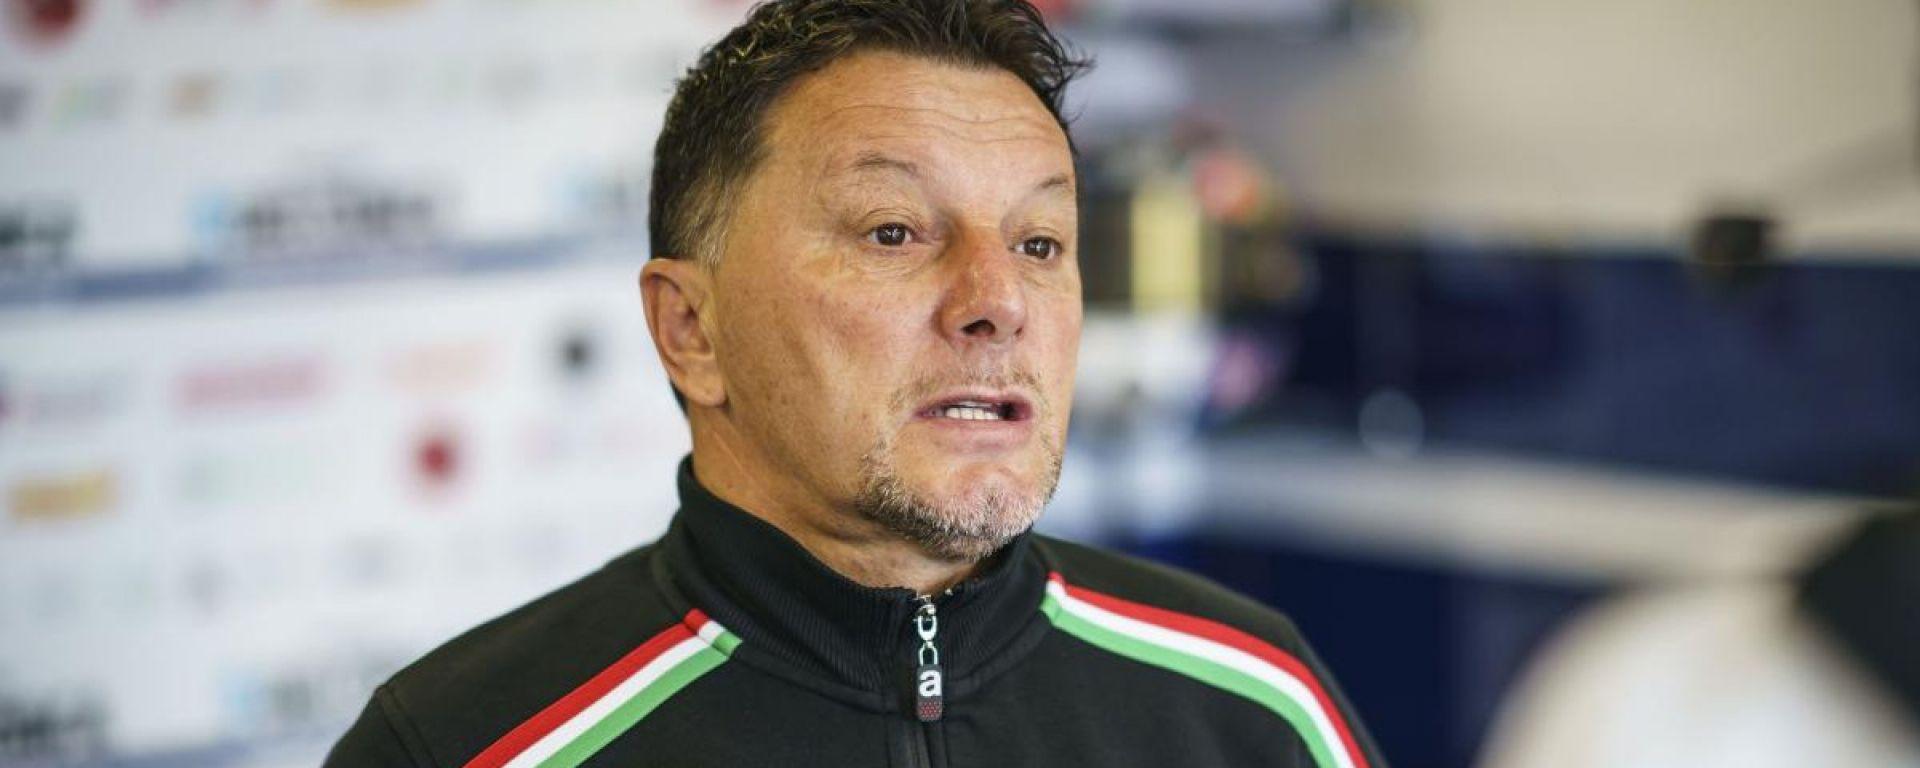 Fausto Gresini, Aprilia Racing